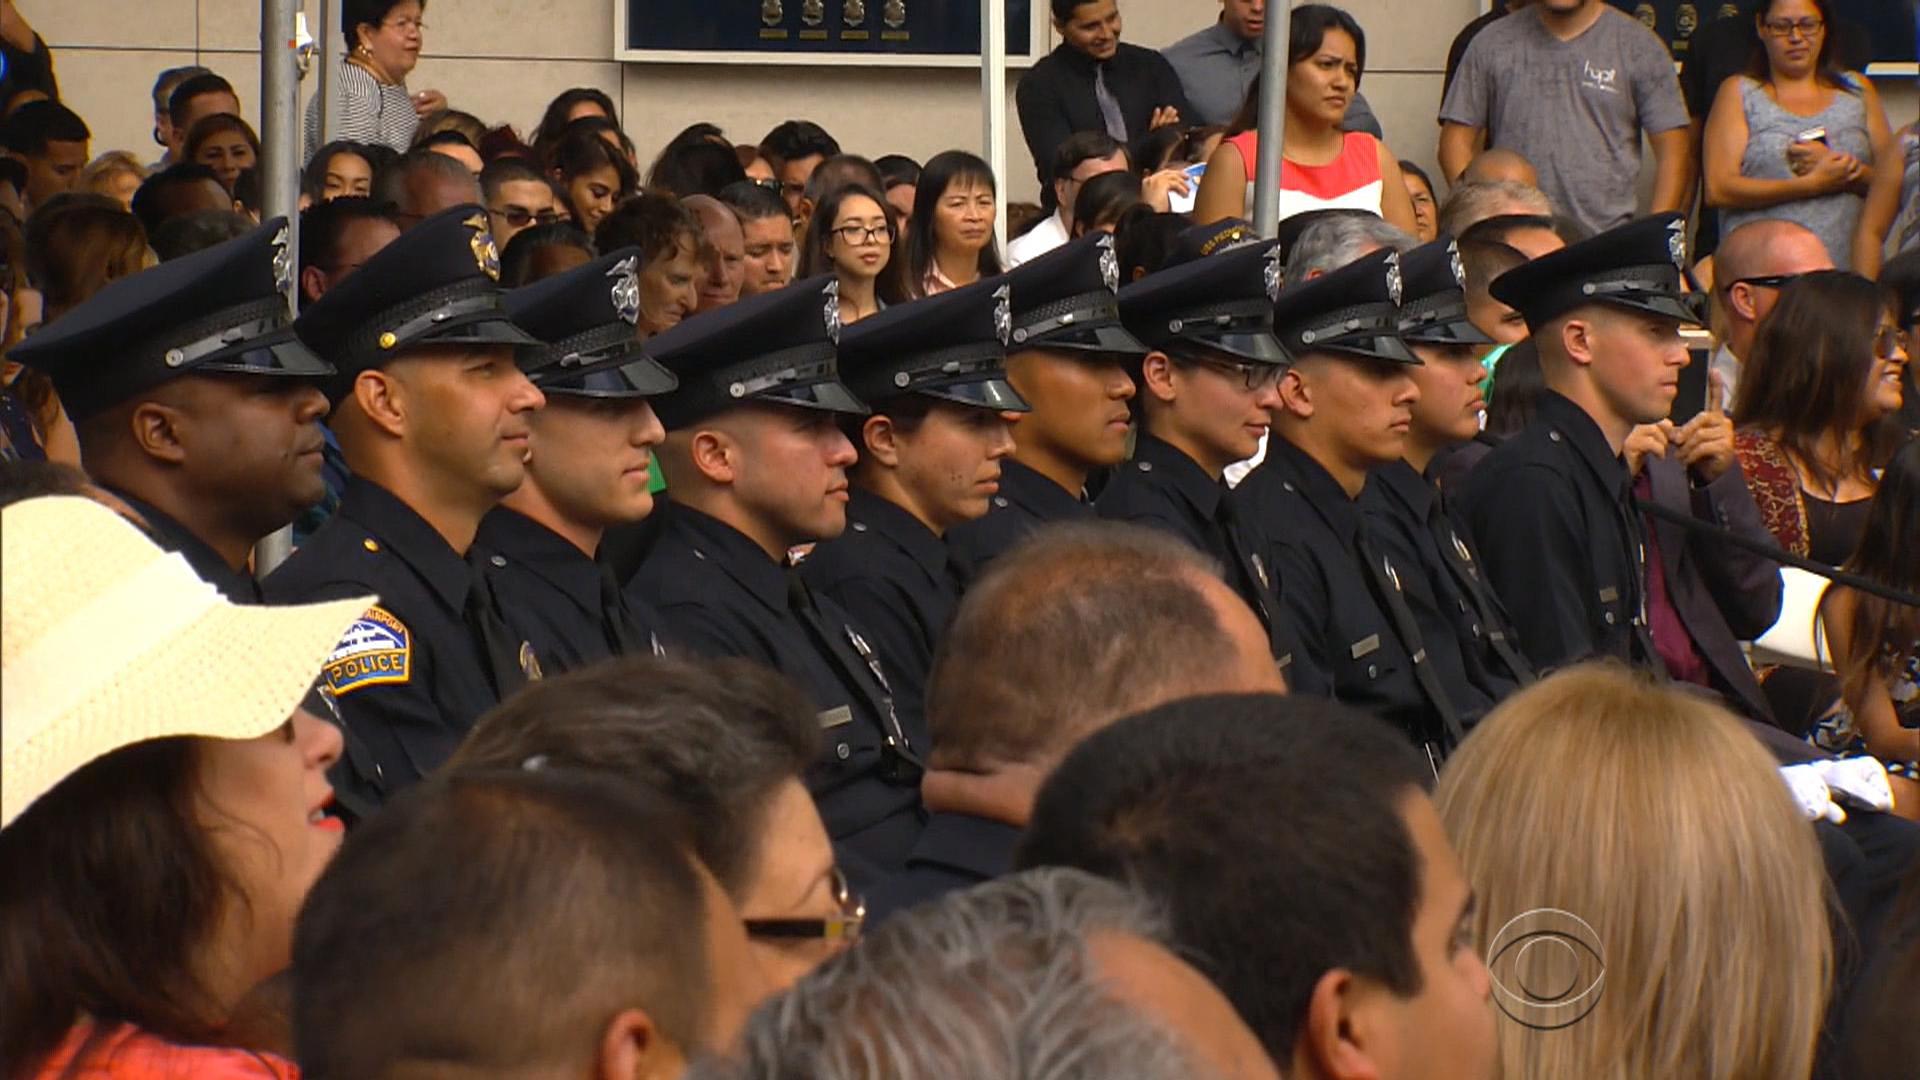 Heavy hearts for Dallas at LAPD graduation ceremony - CBS News